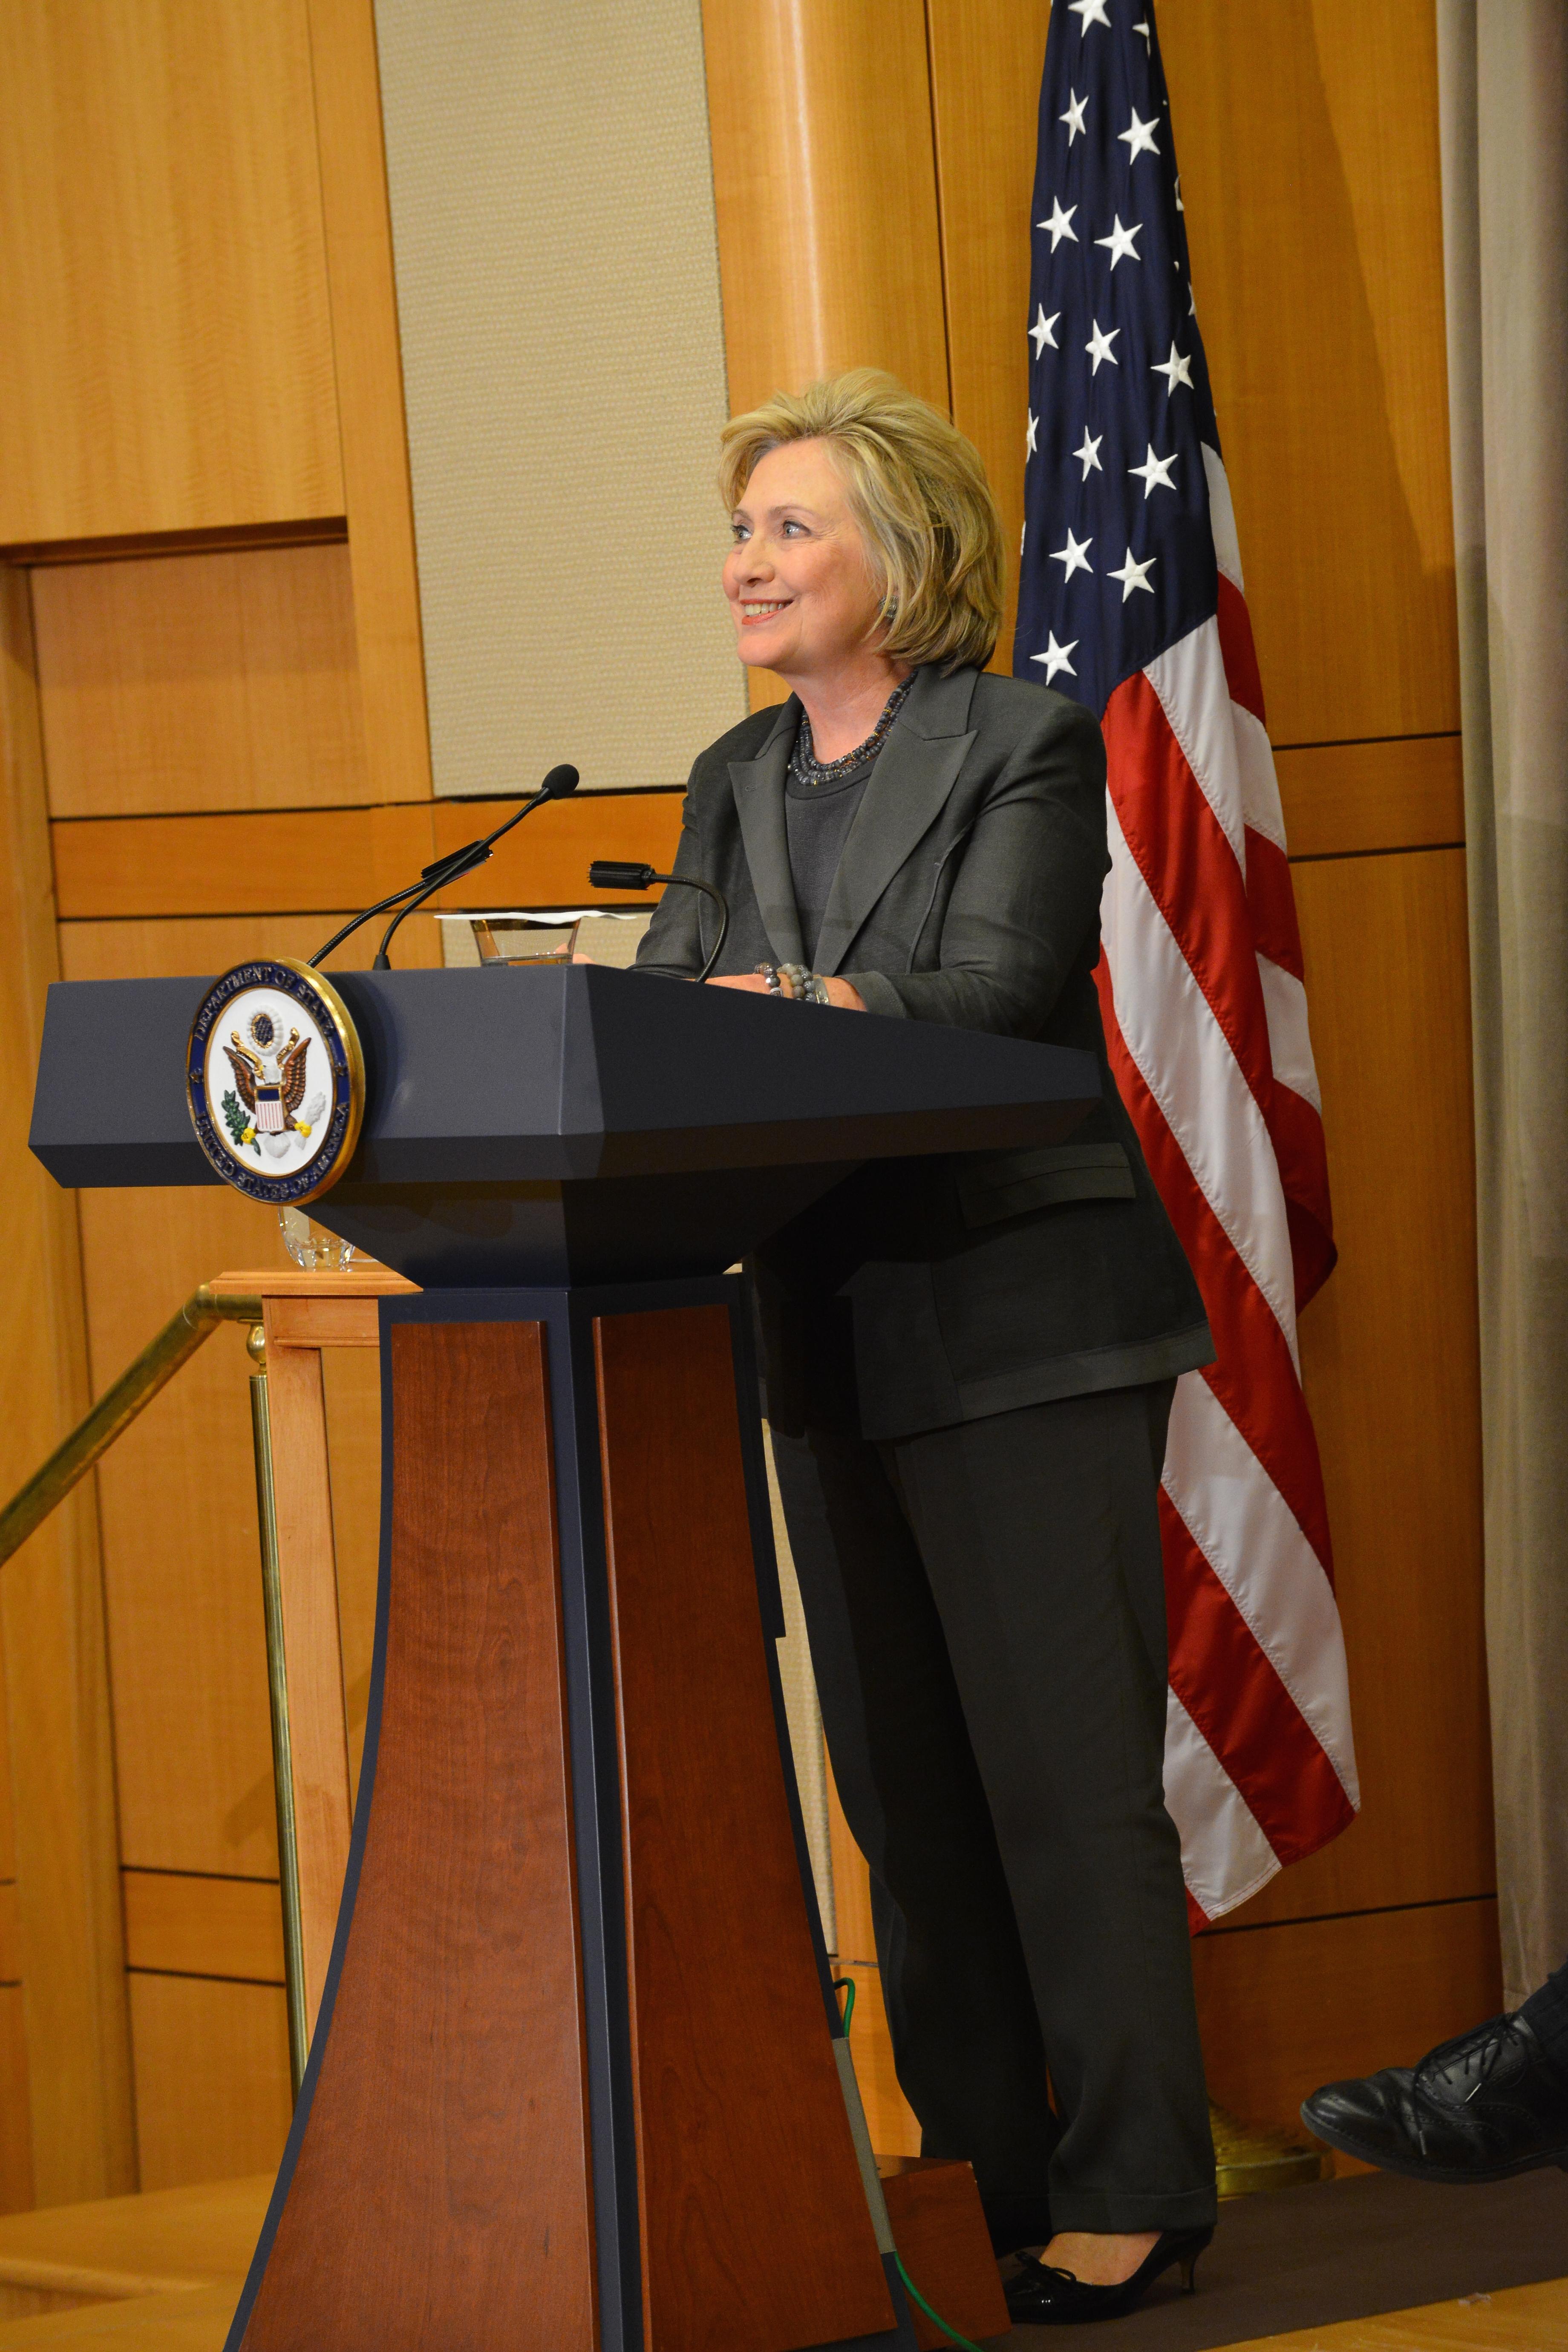 Clinton in September 2014